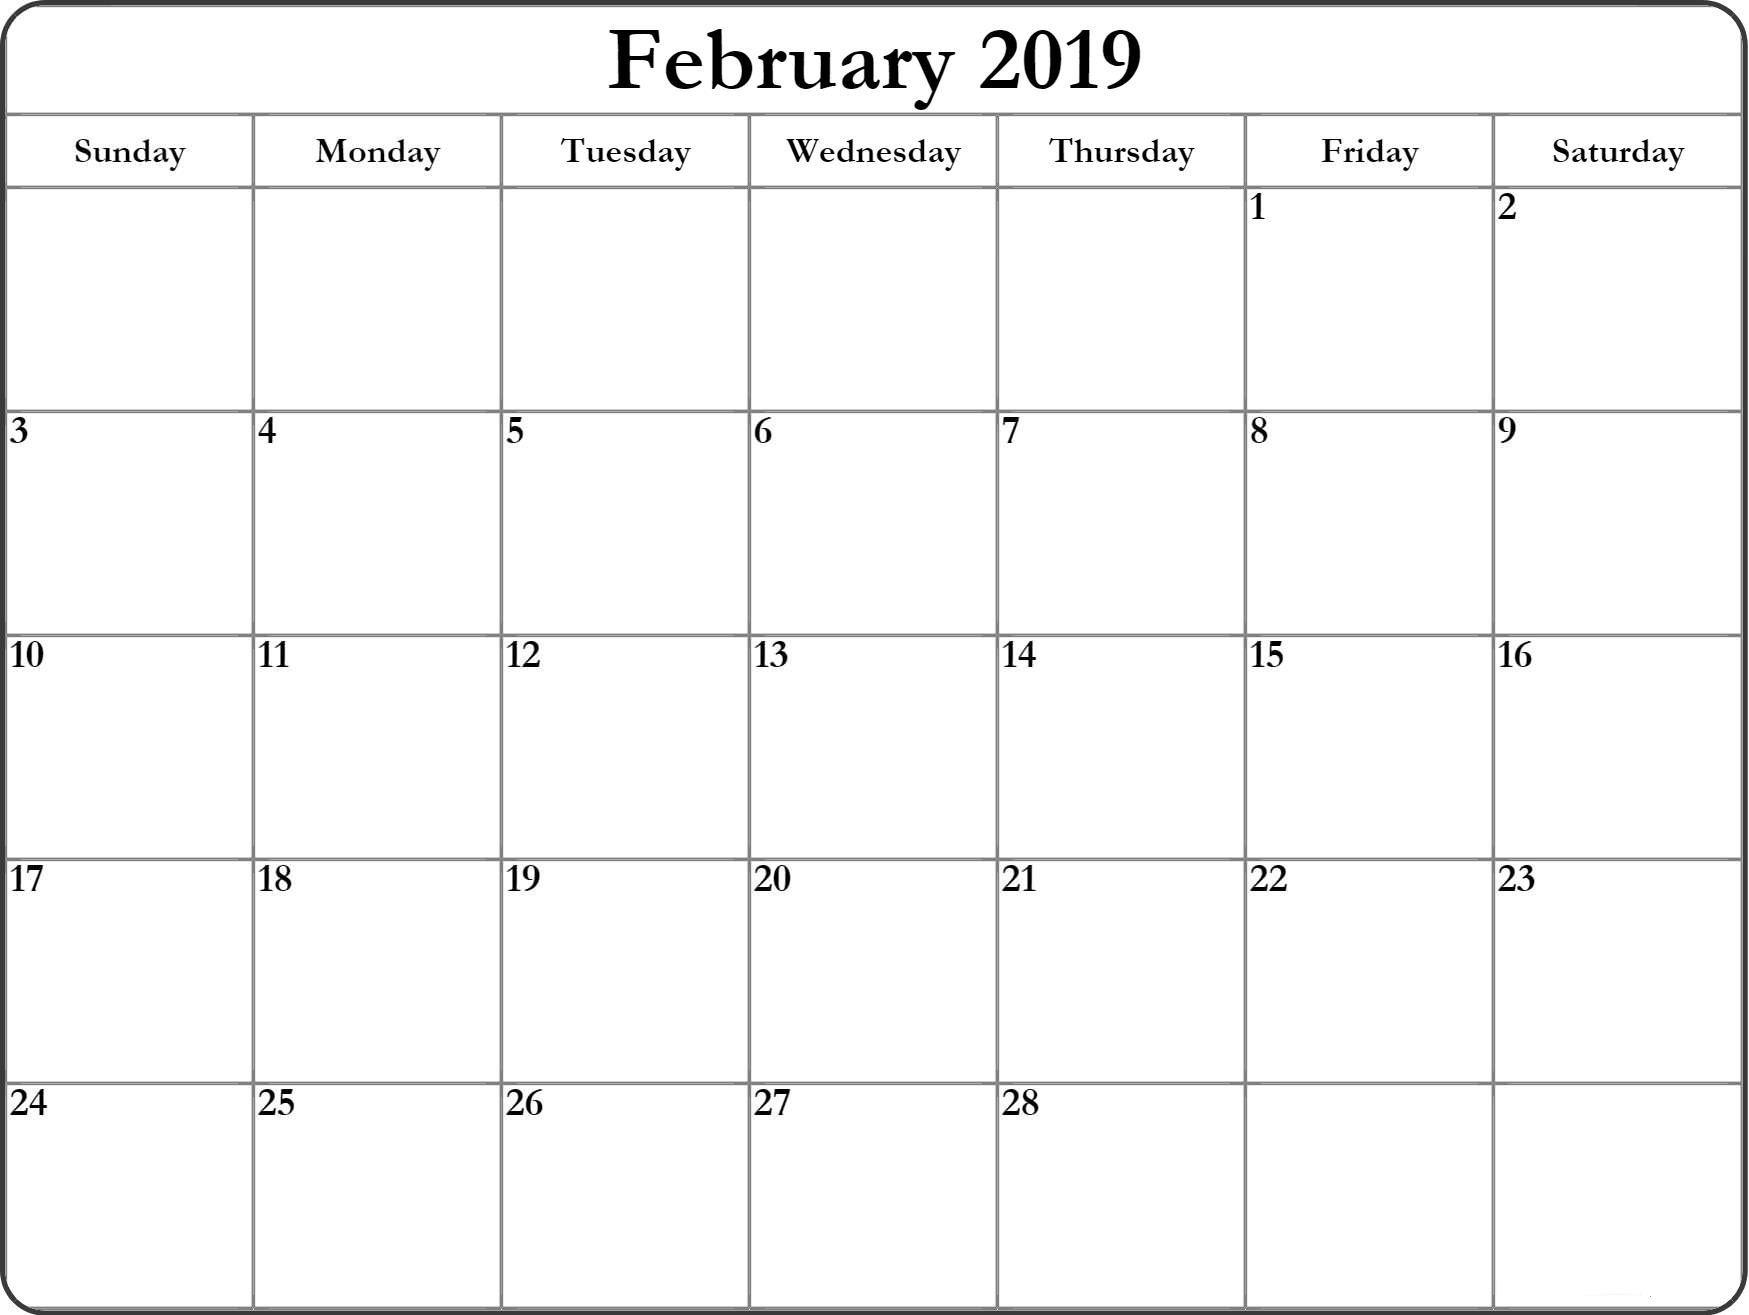 February 2019 Blank Editable Calendar Feb February2019